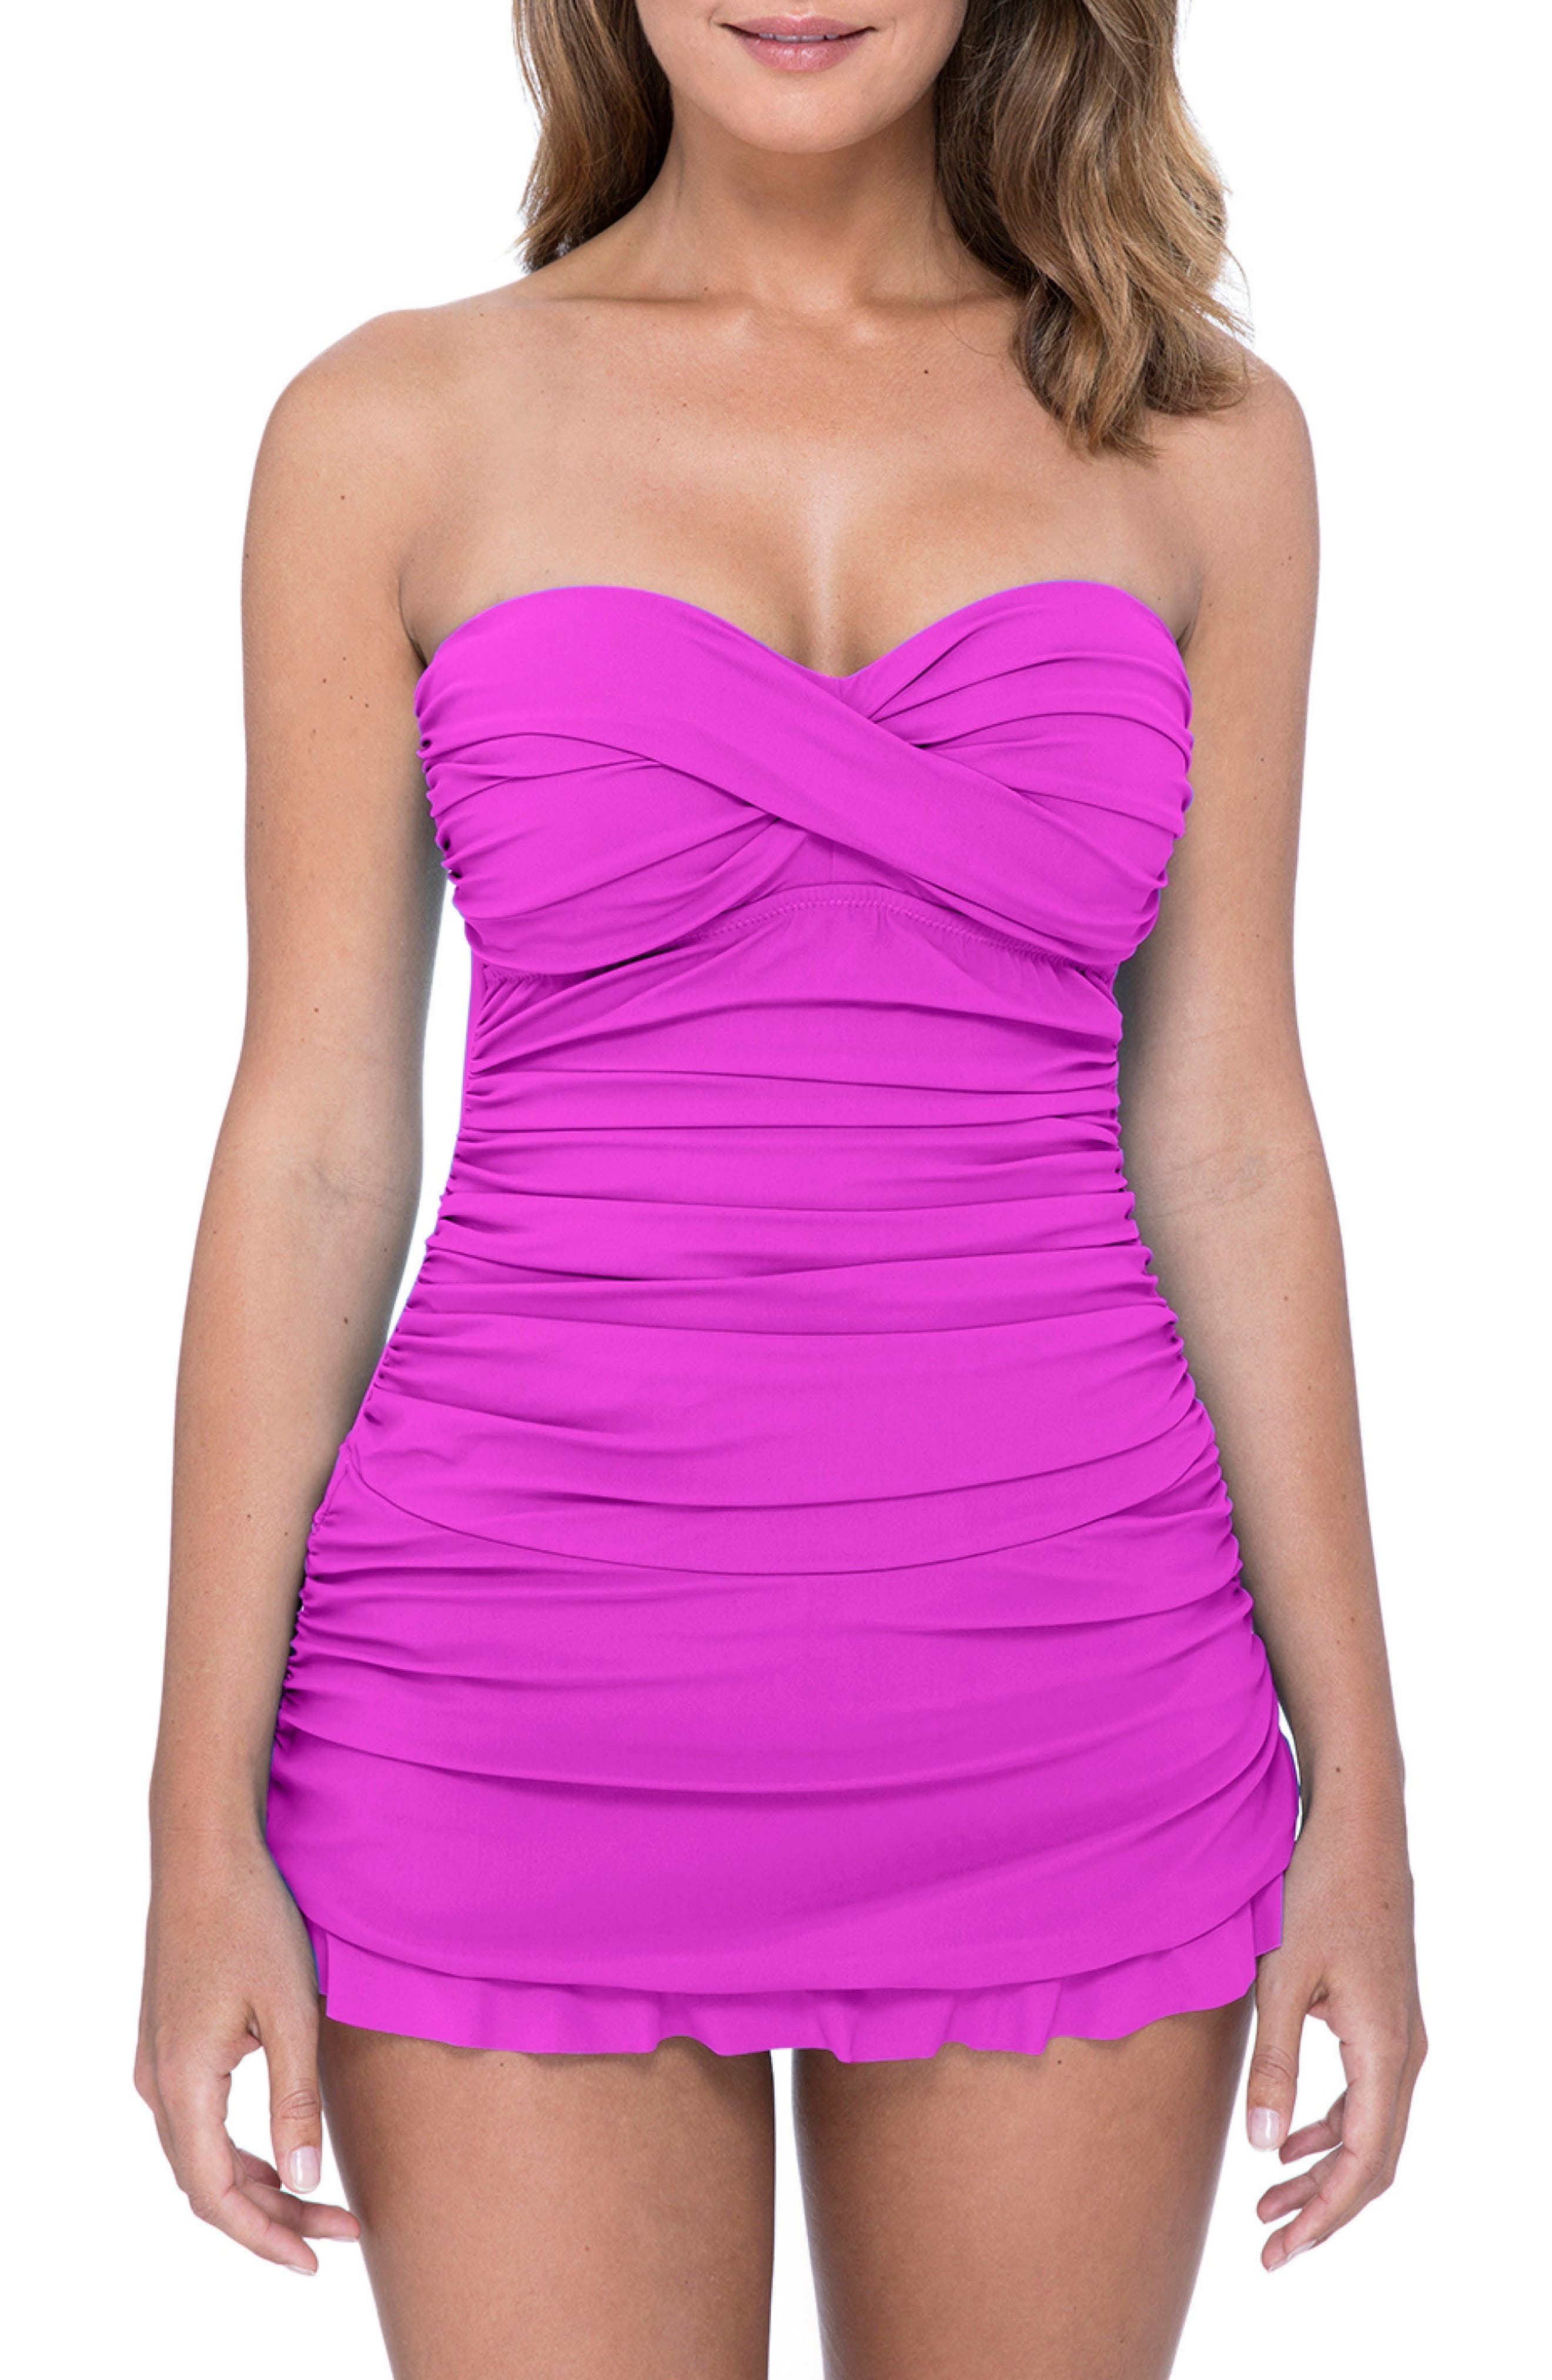 1950s Swimsuits, 50s Bathing Suits, Retro Swimwear Womens Profile By Gottex Tutti Frutti Swim Dress Size 14 - Purple $128.00 AT vintagedancer.com